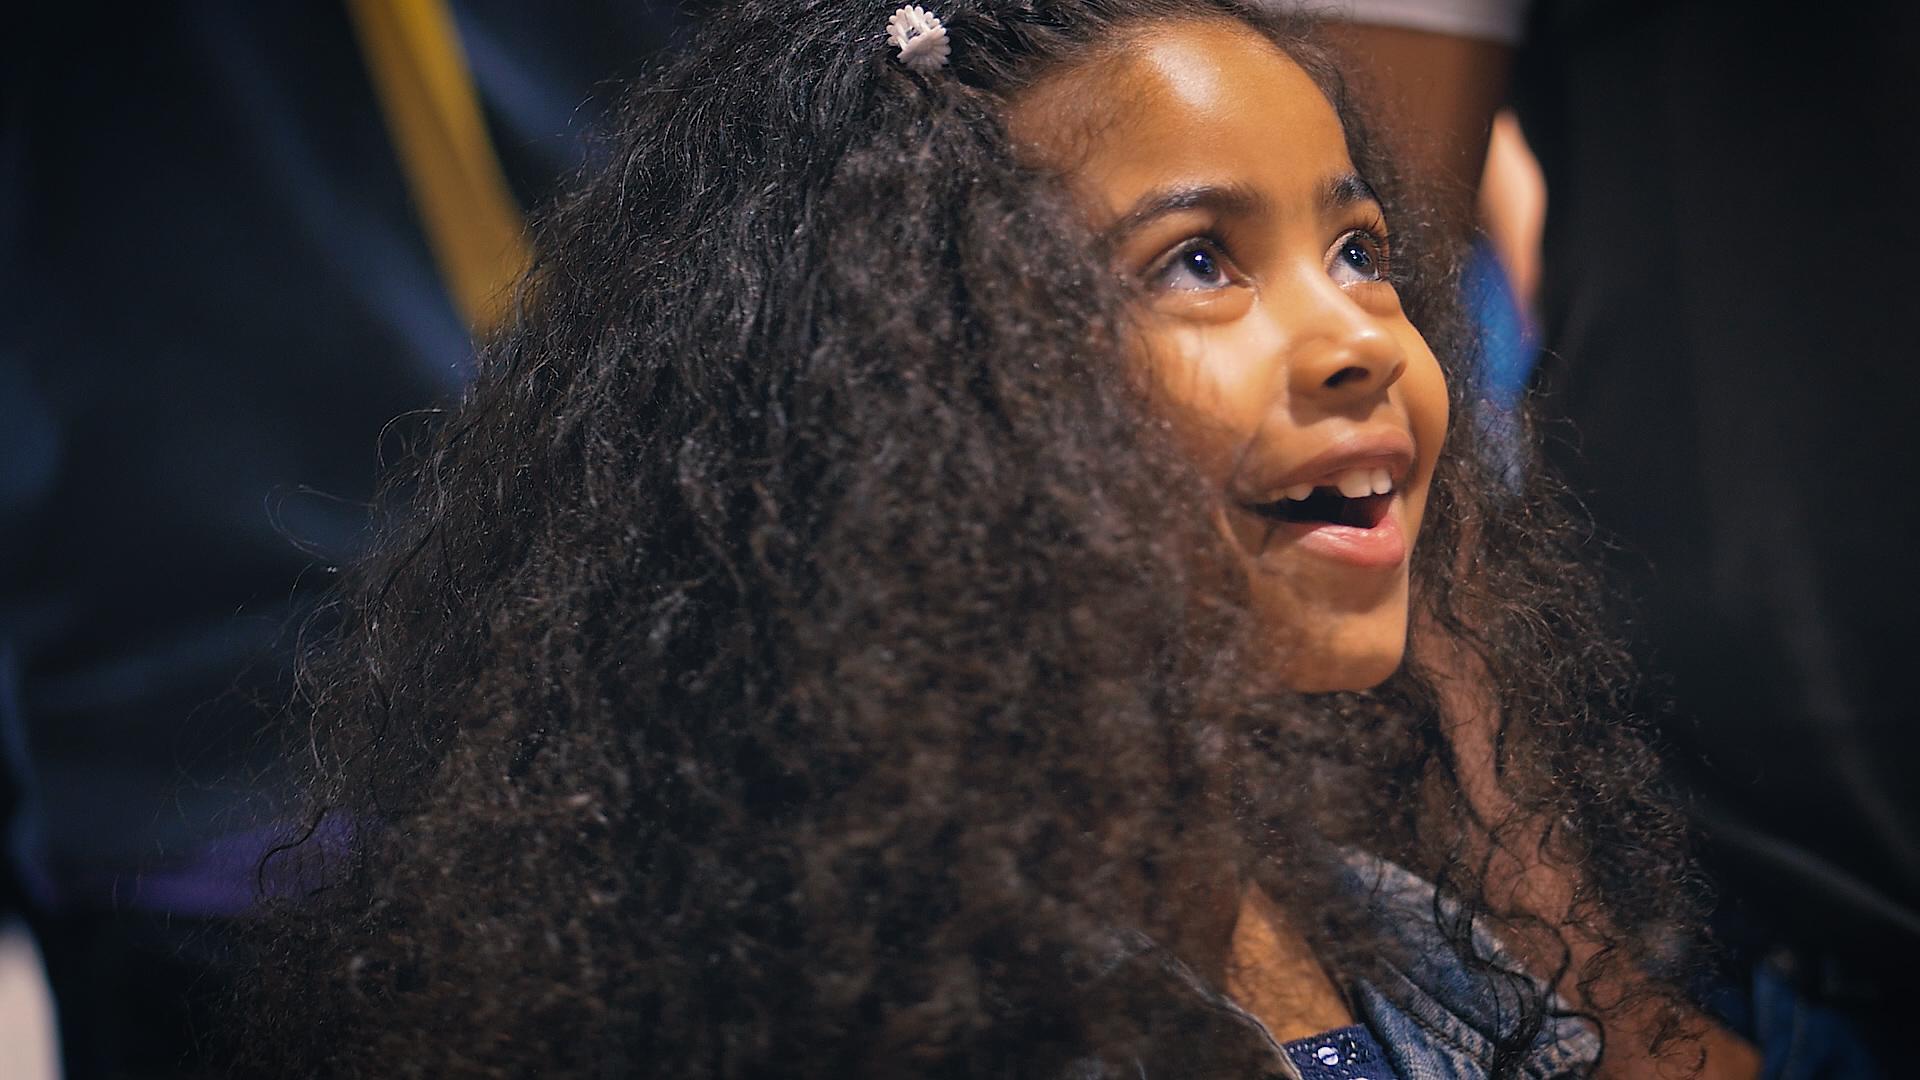 Junior Fashion Showcase Kids Videographer Slow Motion Children Modelling